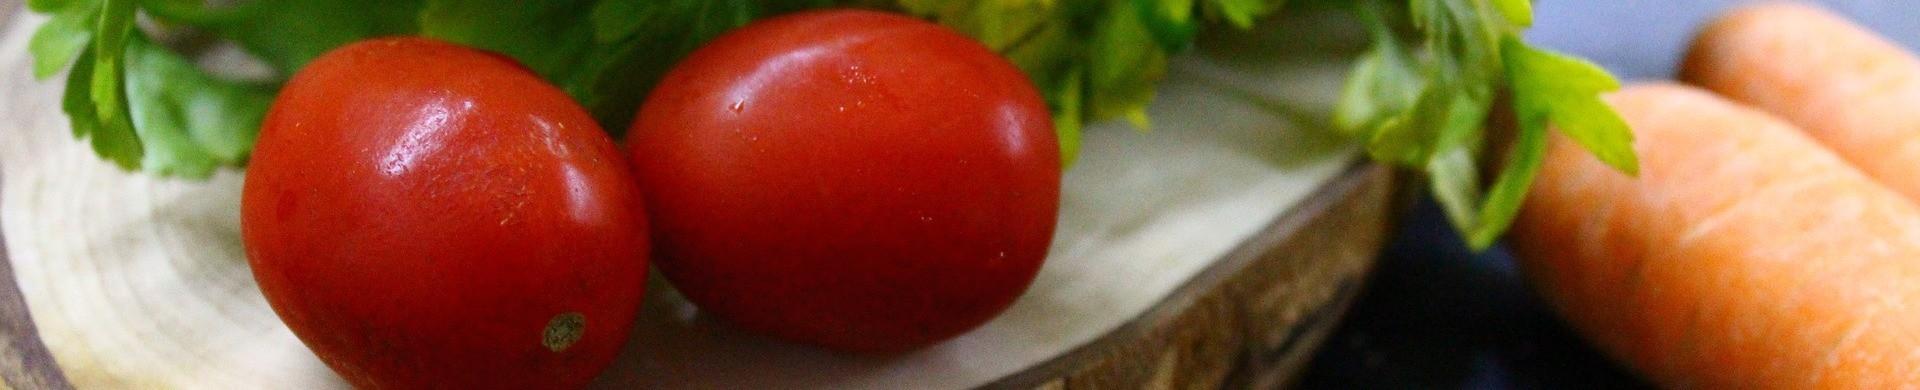 Comprar plantas de tomates - Plantas o matas de tomate online